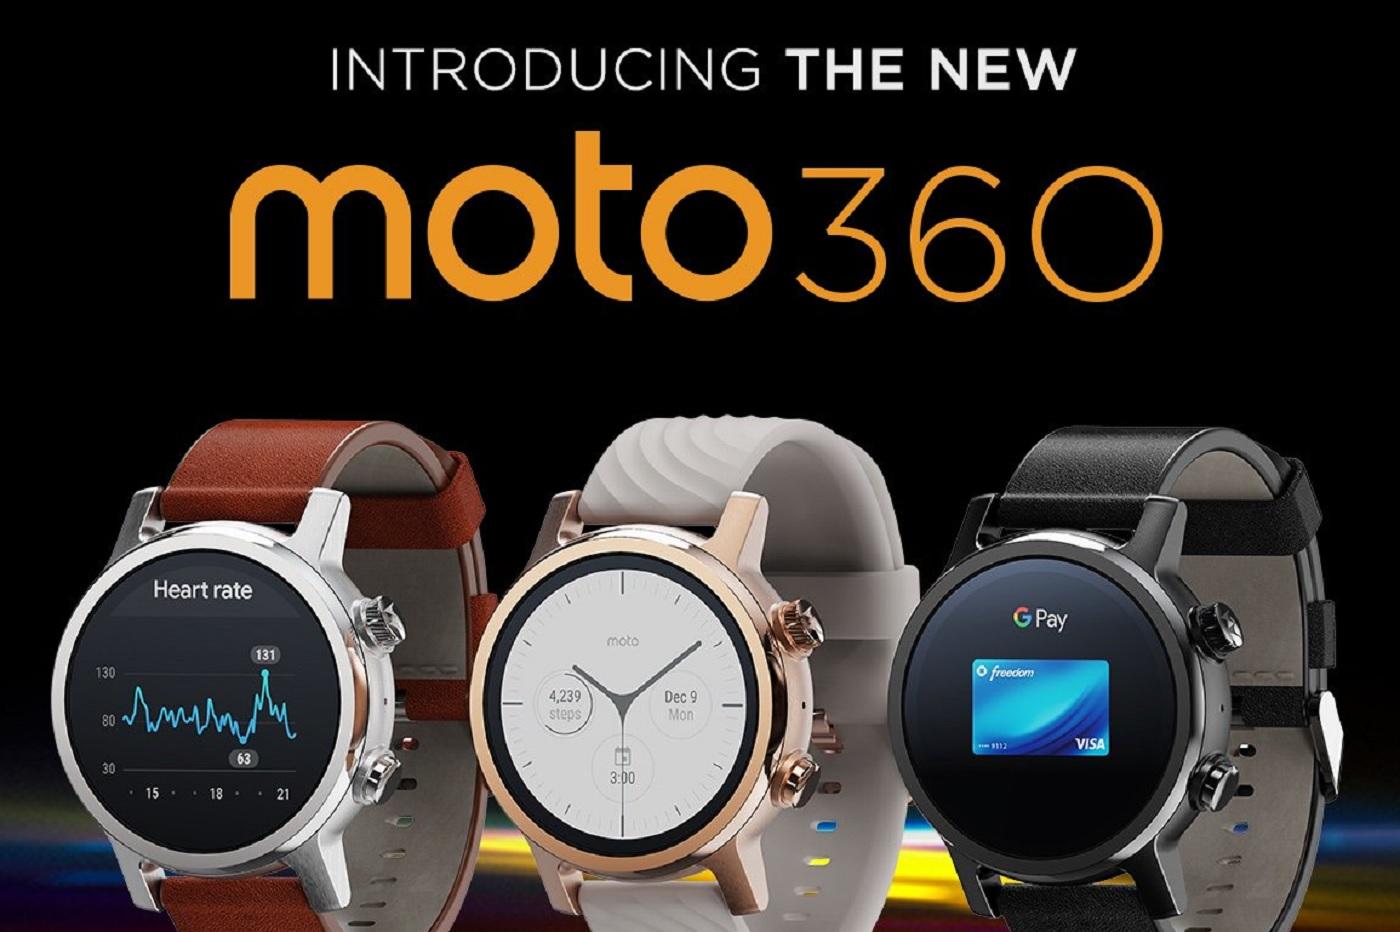 La nouvelle monre Moto 360